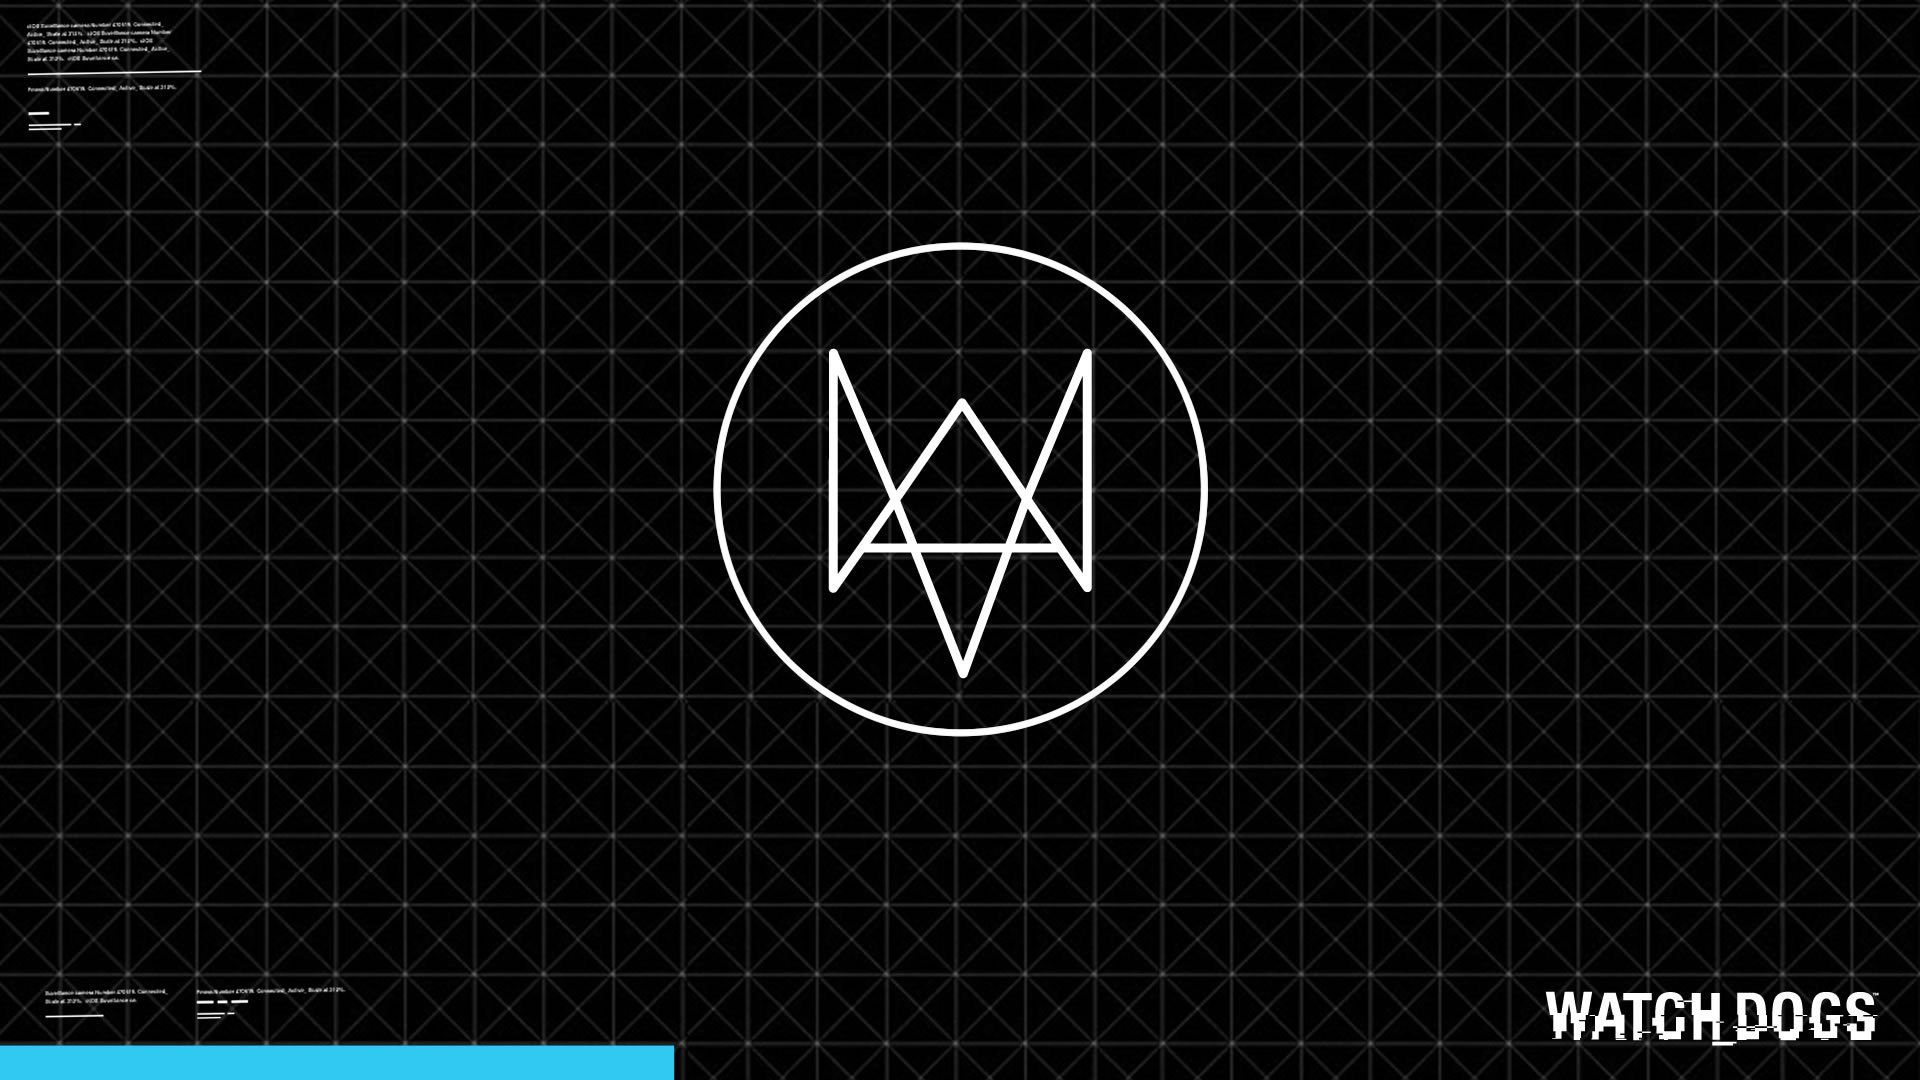 Watch Dogs Fox Logo Wallpapers Full Hd Sdeerwallpaper Fondos